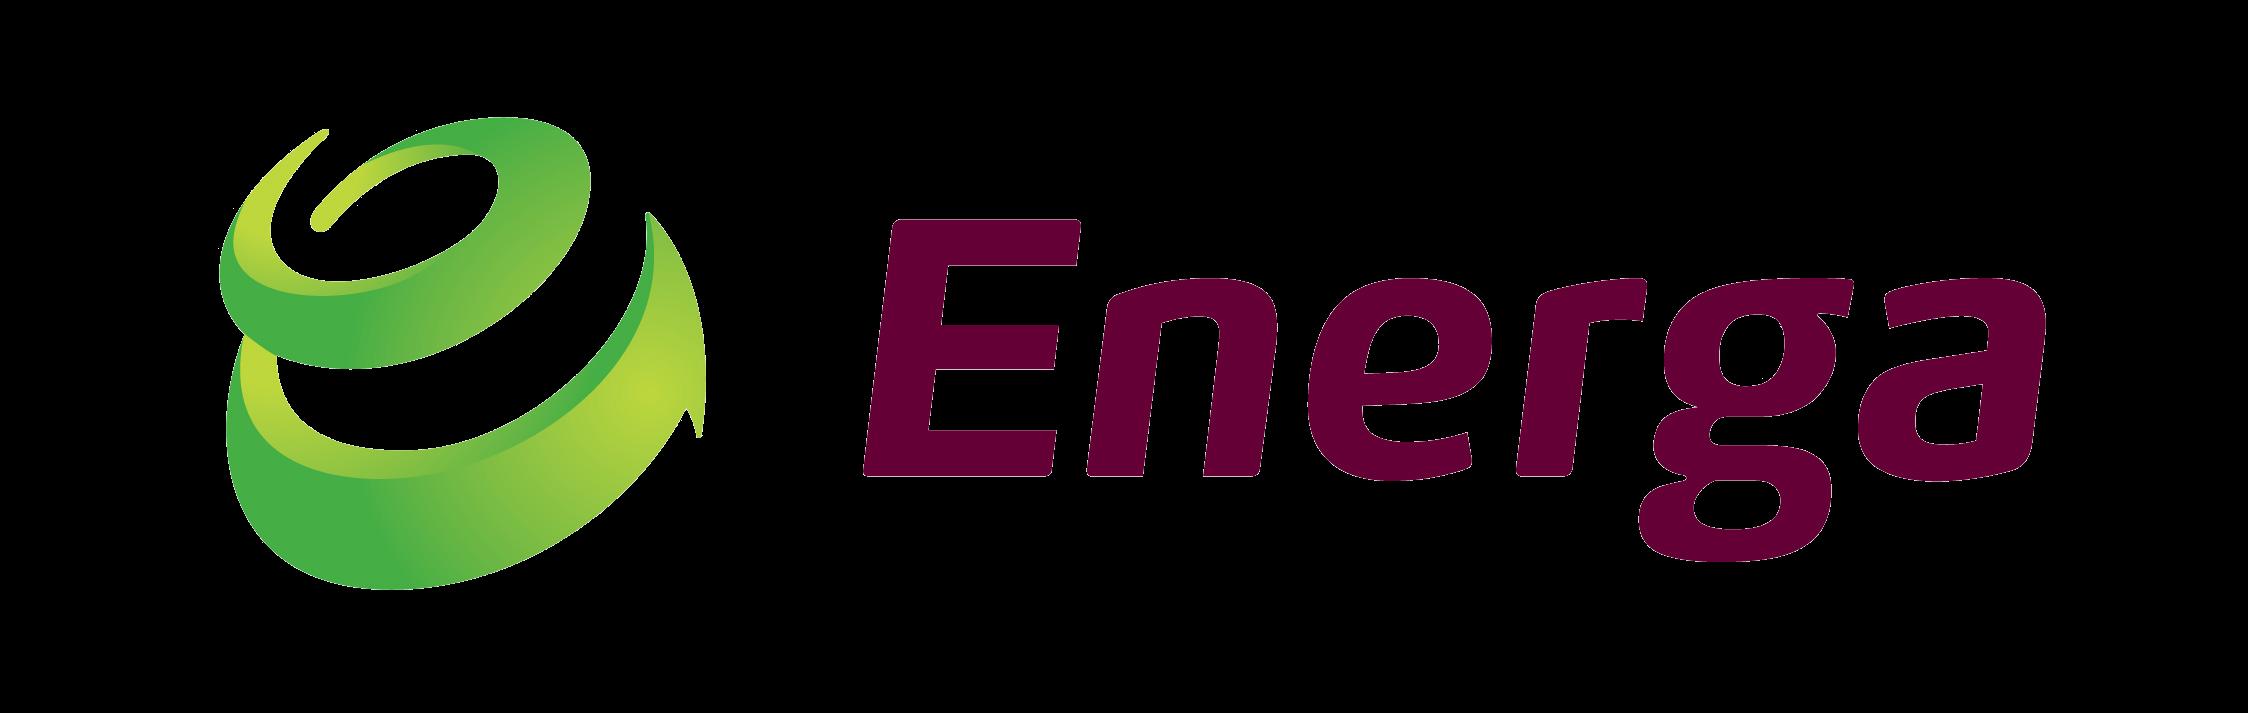 Znalezione obrazy dla zapytania Energa logo